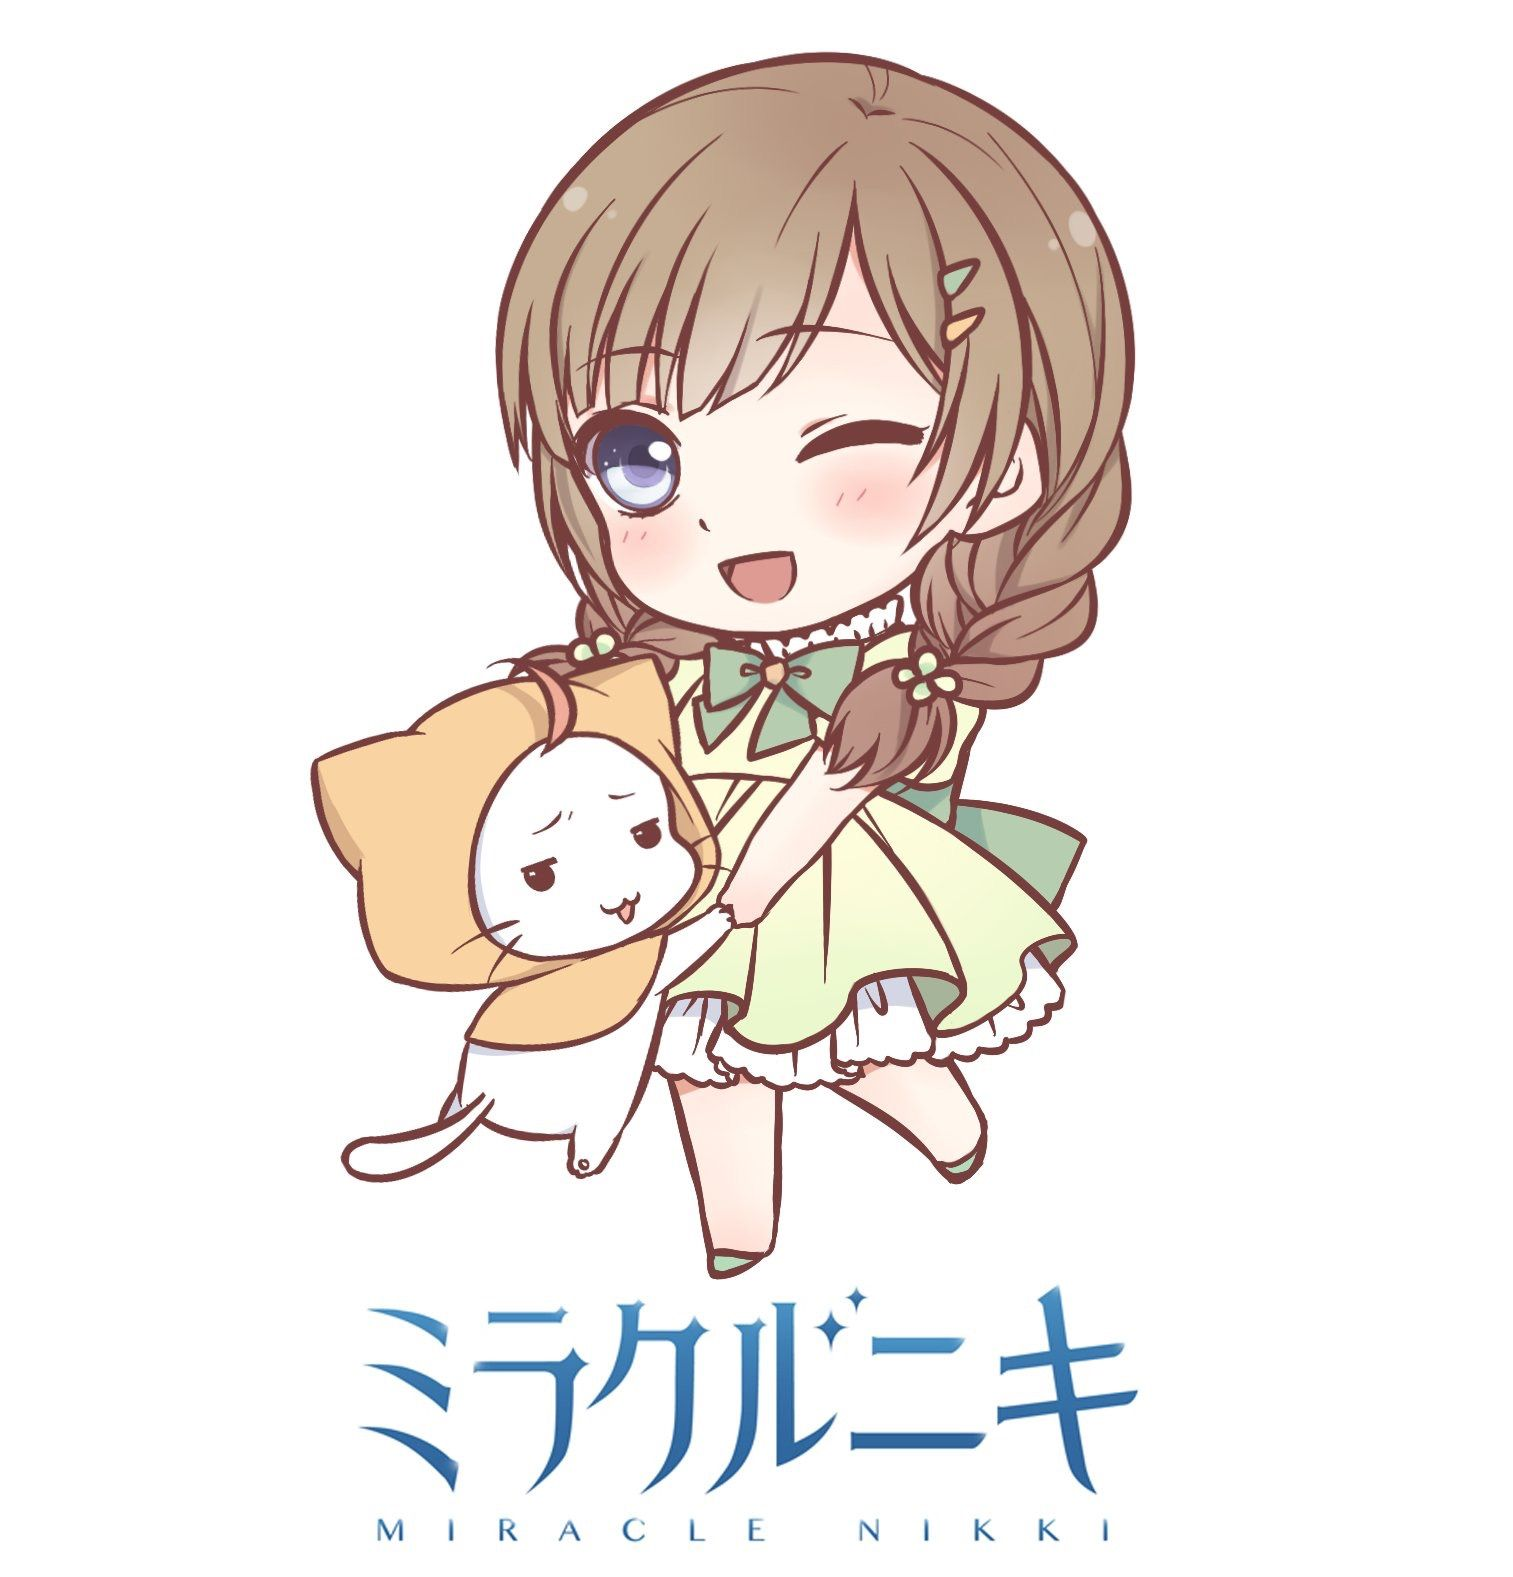 Uncategorized Chibi Cartoon pin by alreem on png4 pinterest chibi anime and kawaii art drawing food girl sao illustration girls